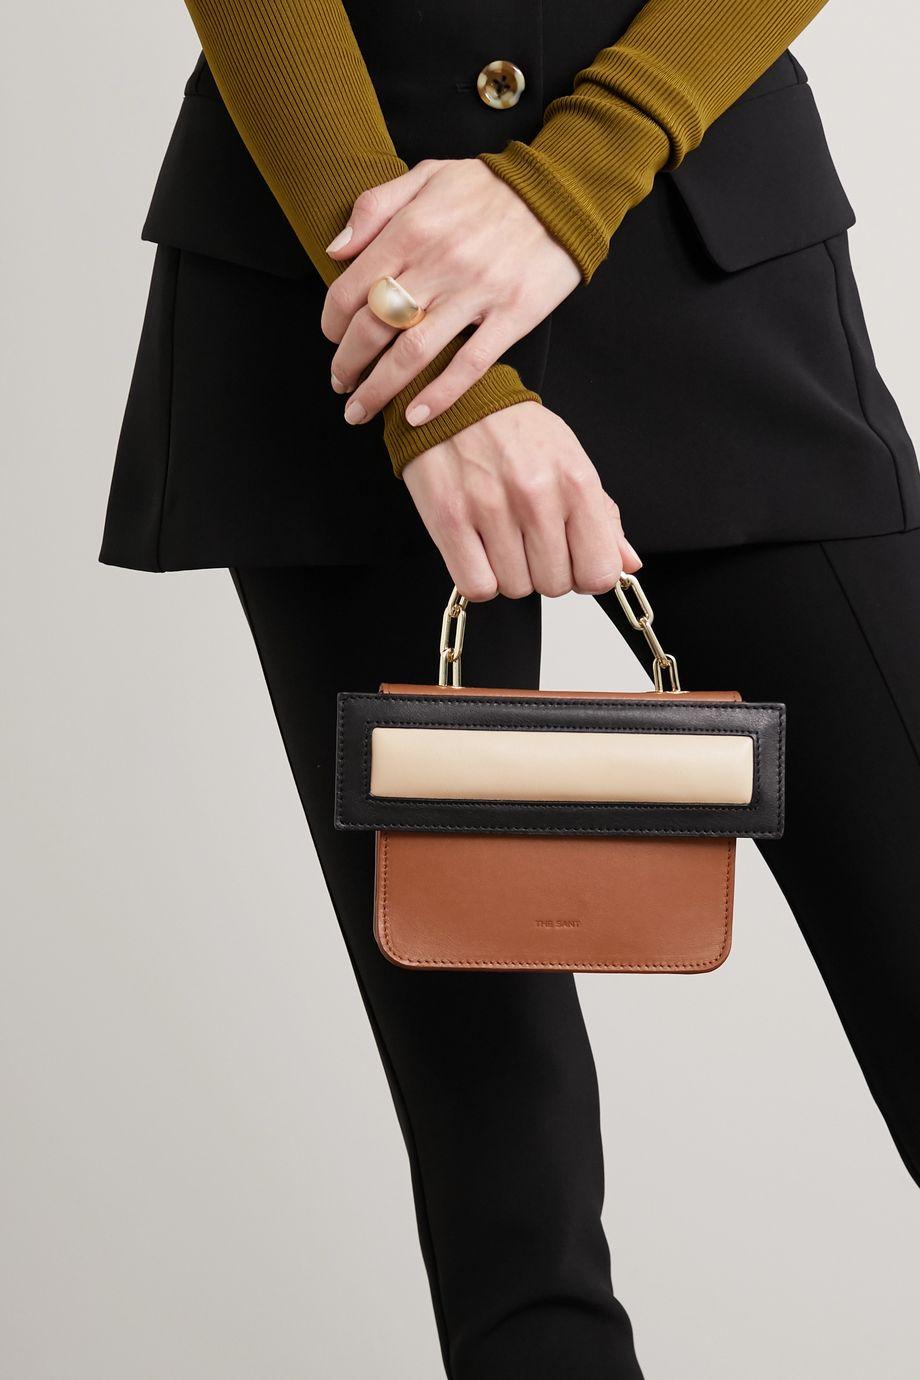 The Sant Himitsu Bako mini color-block leather tote